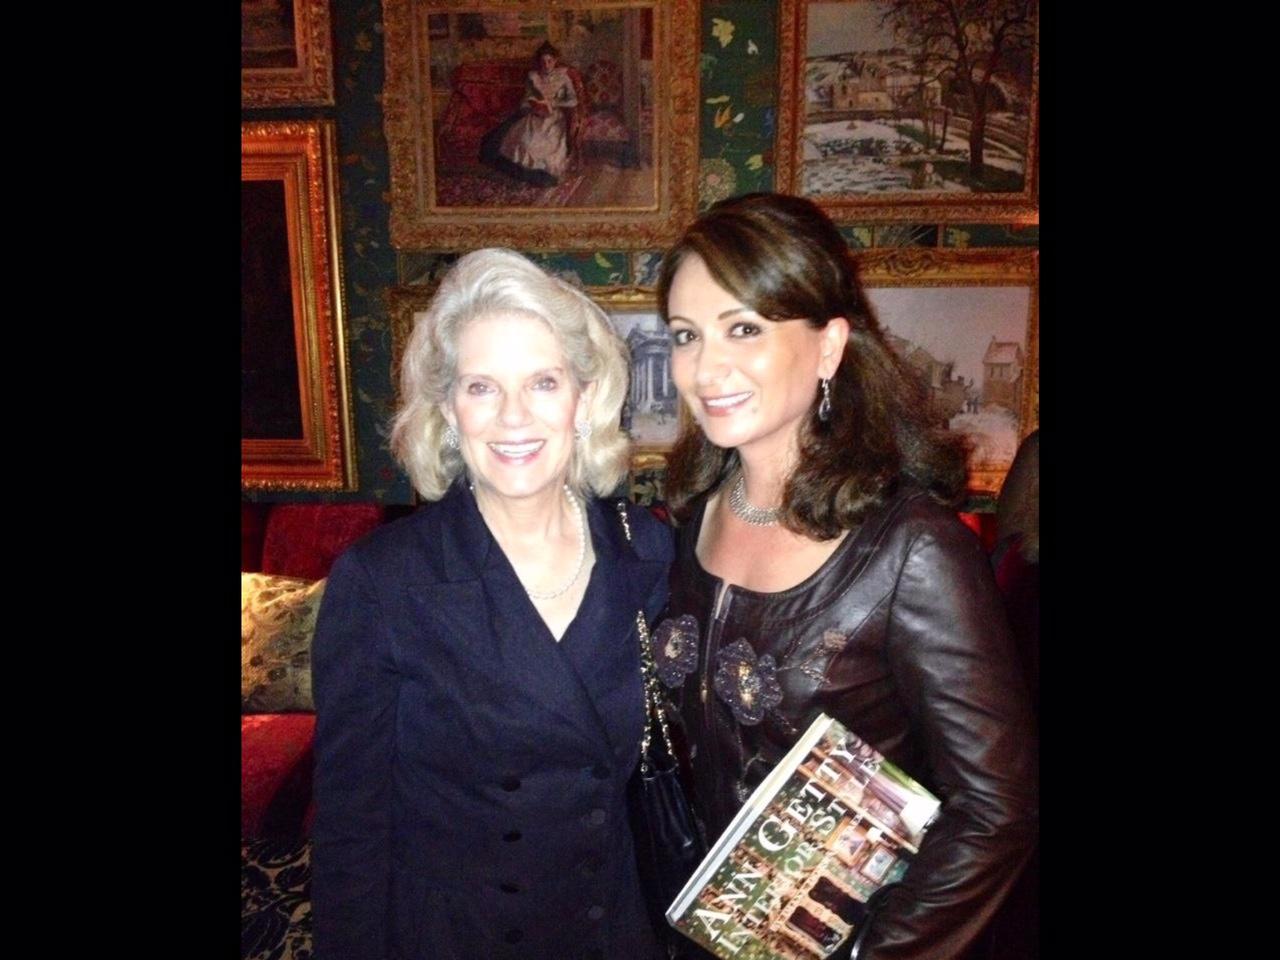 Deborah Hatch (Art Curator for Mrs. Ann Getty)and Papillon Rug Care owner Mahnaz Shoeiby at Mrs. Getty's residence.